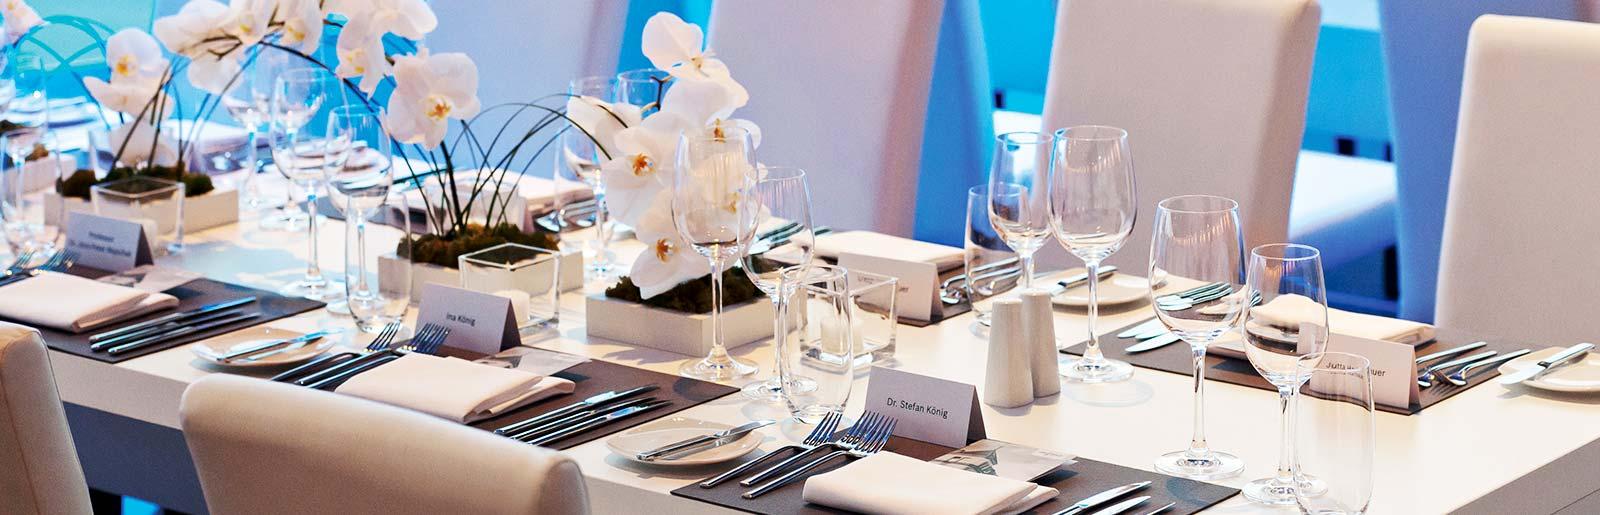 PROFIMIET Non-Food-Catering Eventdekoration Tischgedeck